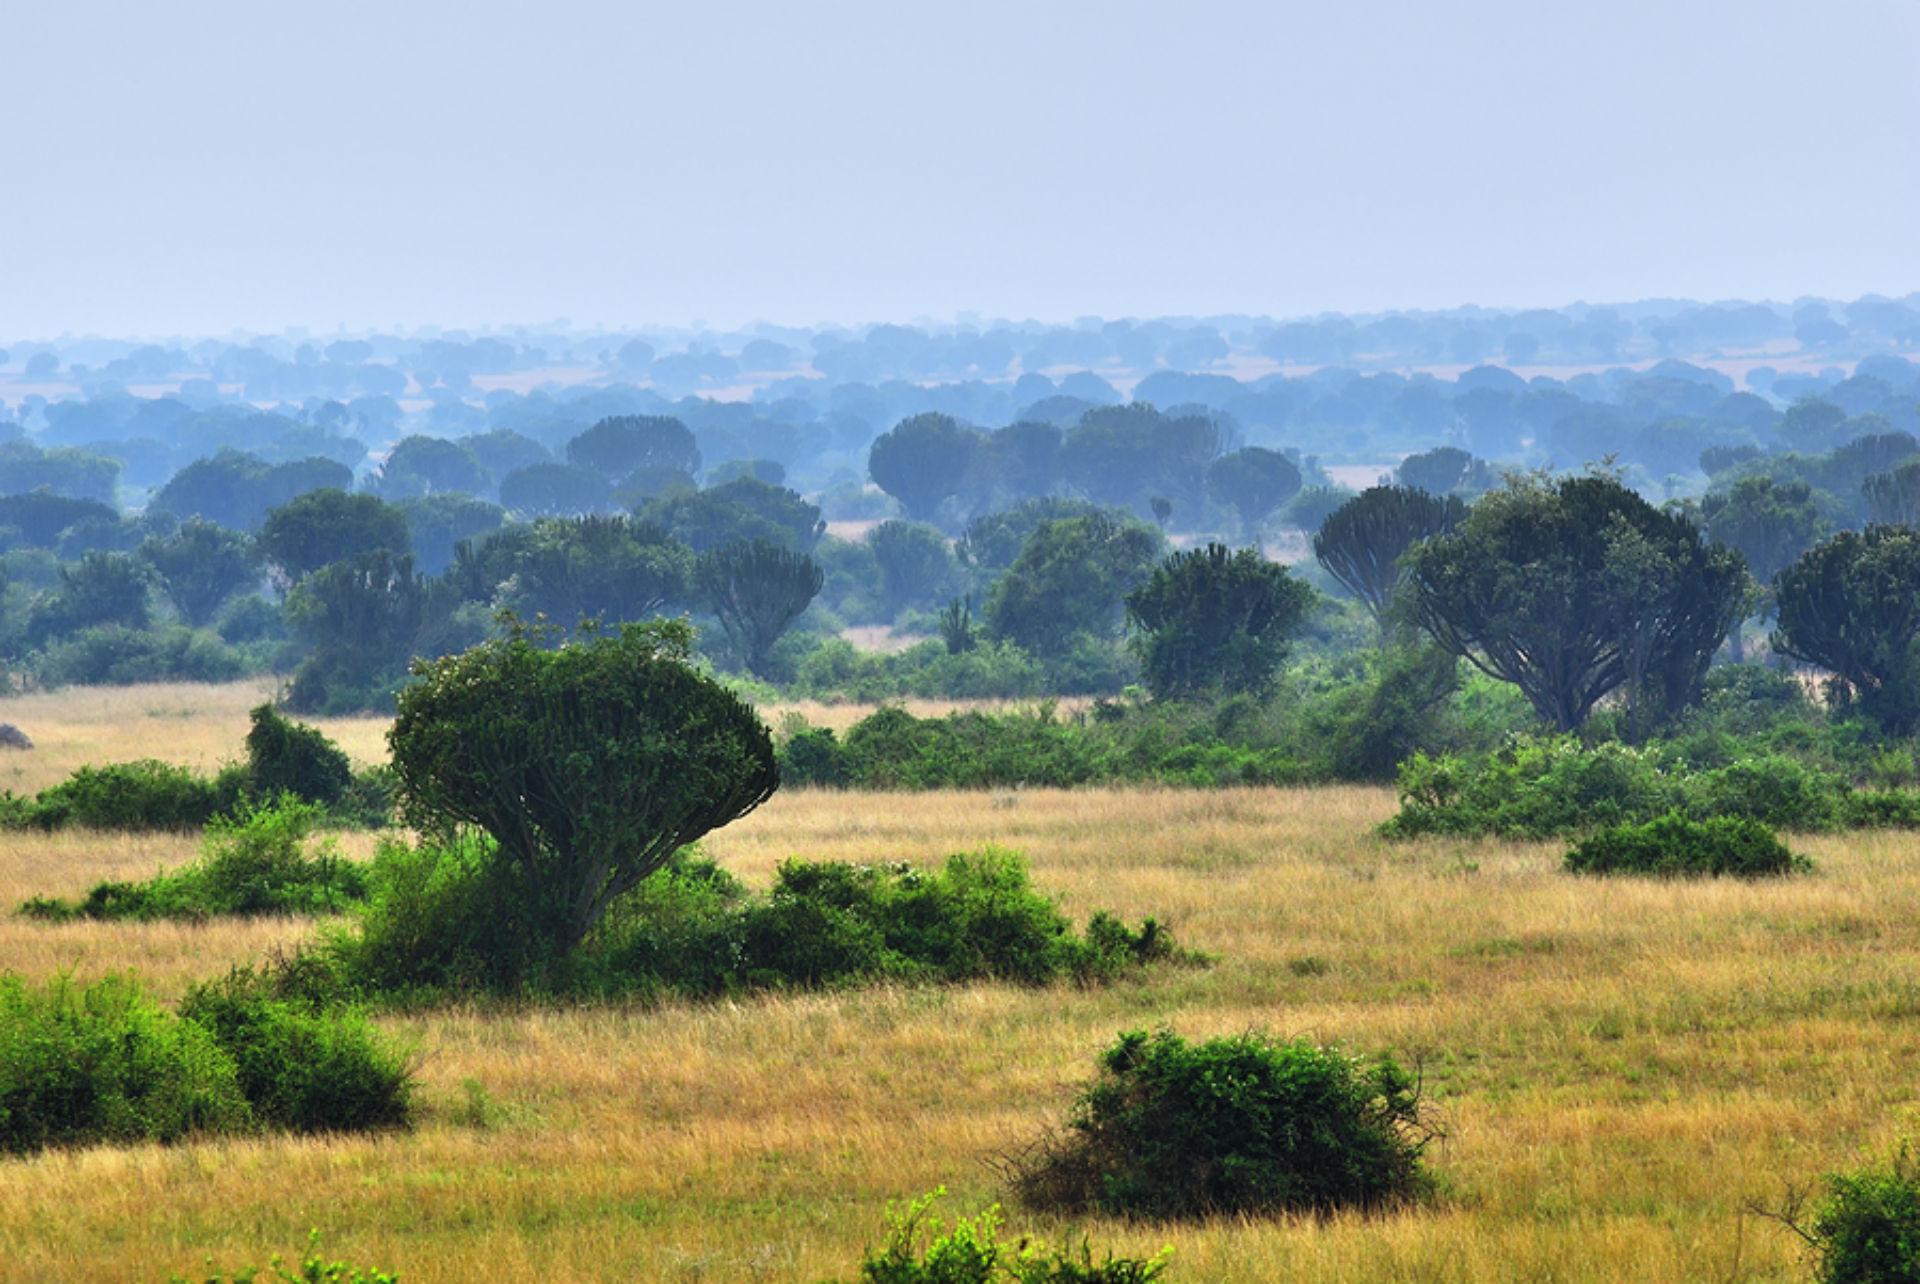 Queen Elizabeth Park Uganda_1554381469463.jpg.jpg